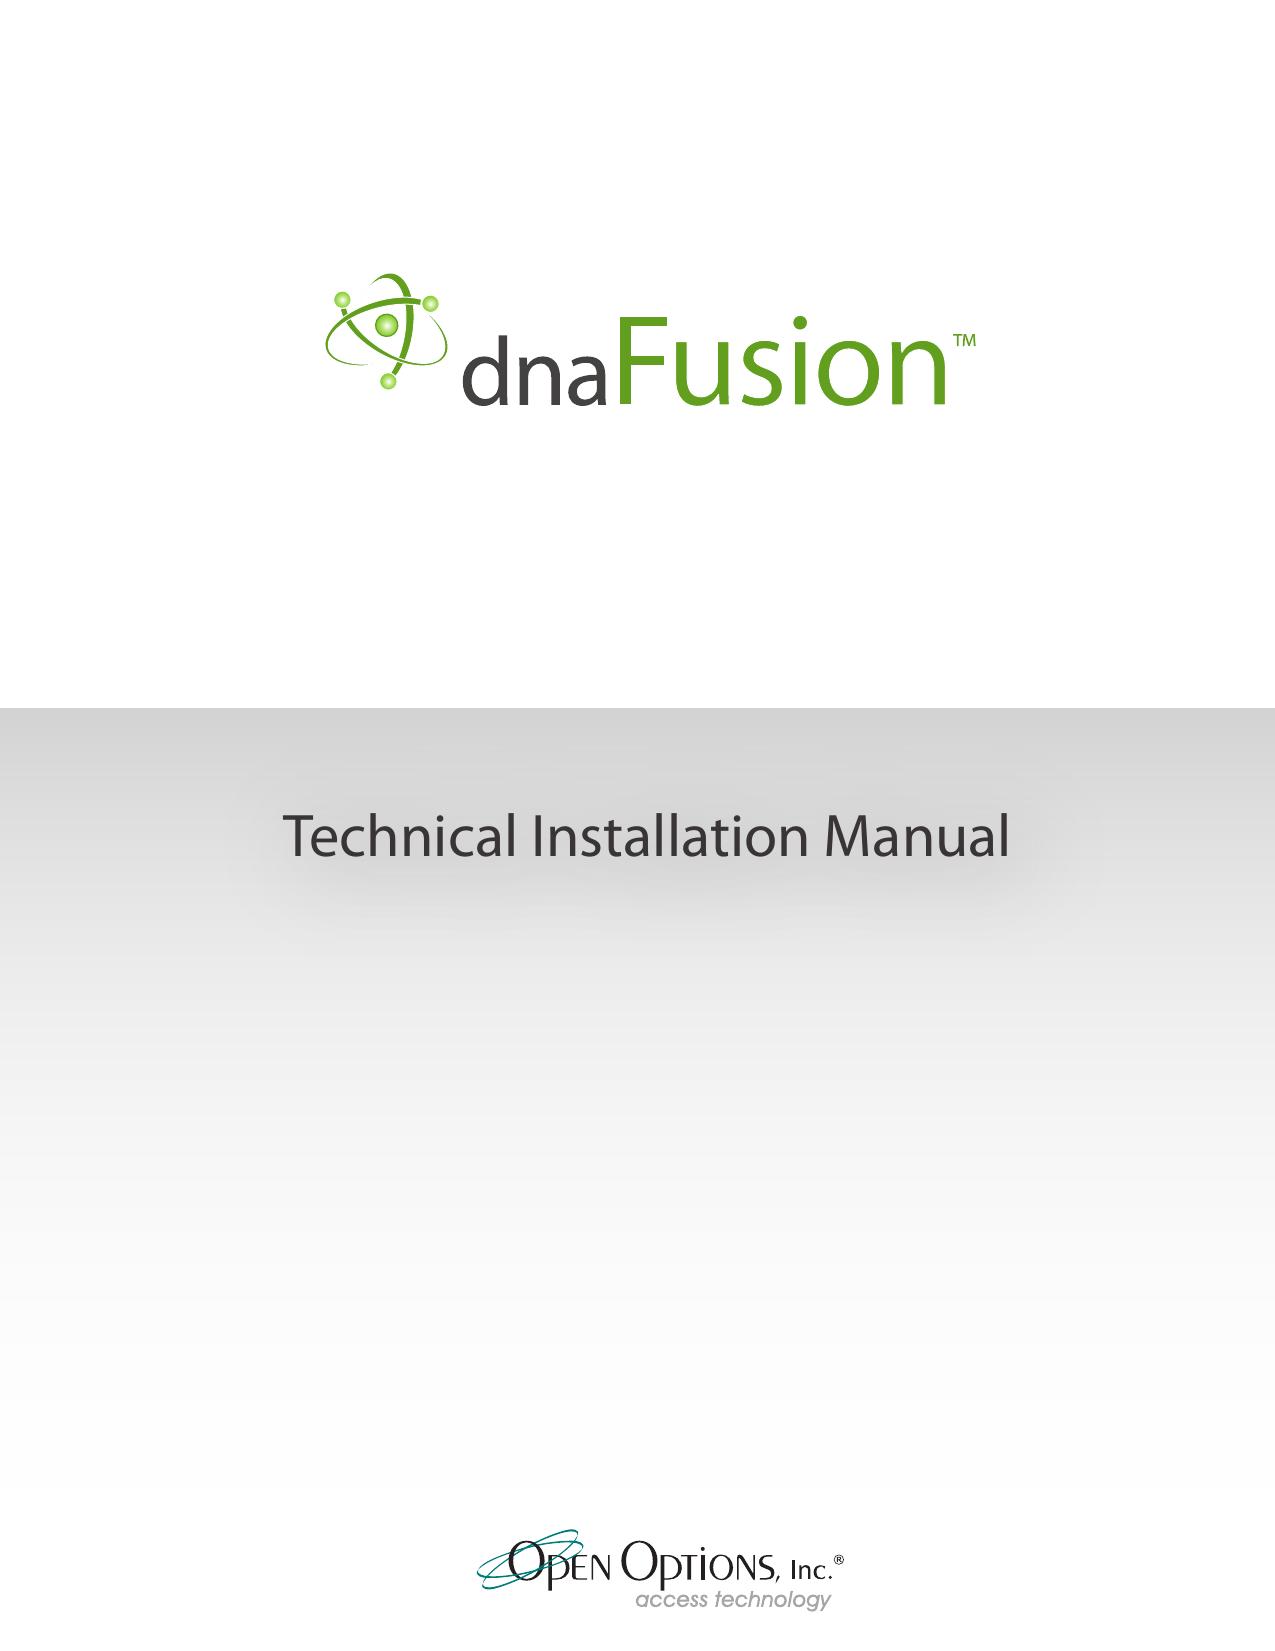 DNA Fusion - Technical Installation Manual | manualzz.com on